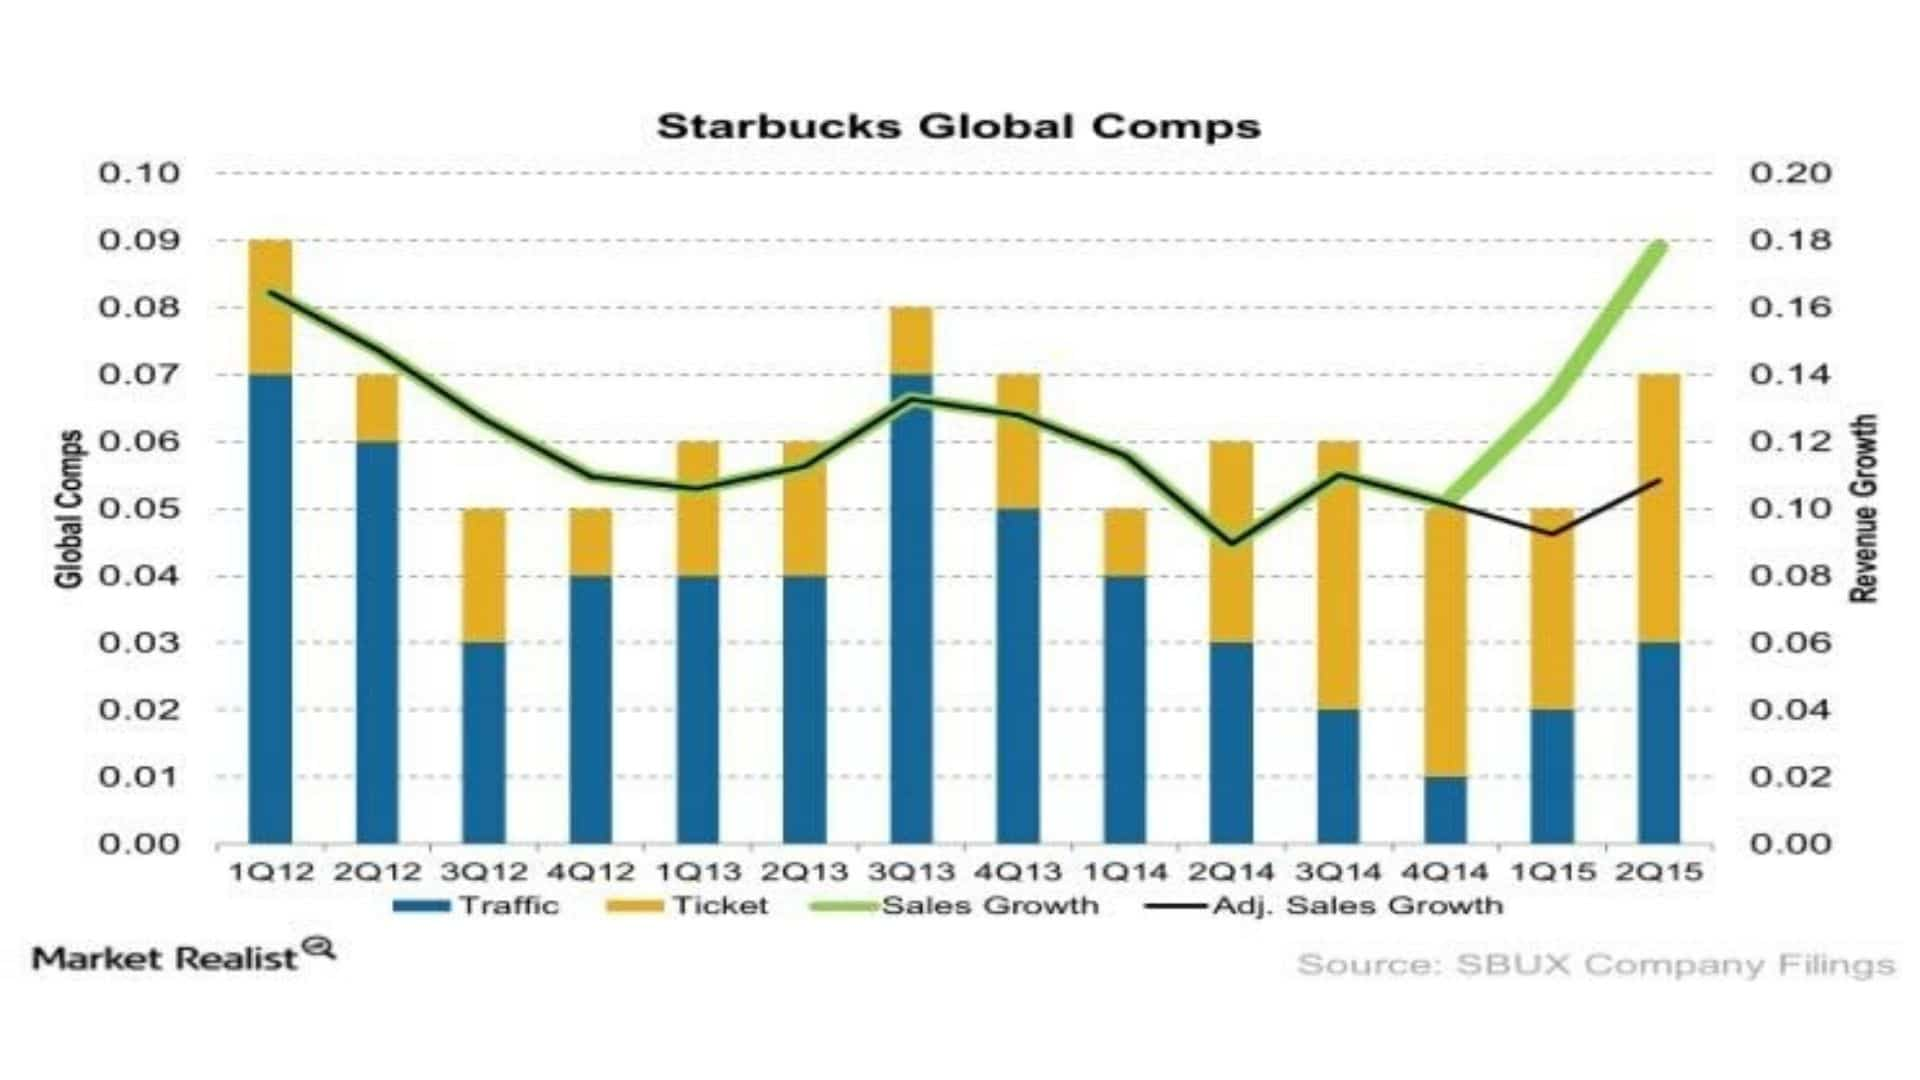 Starbucks Business Growth